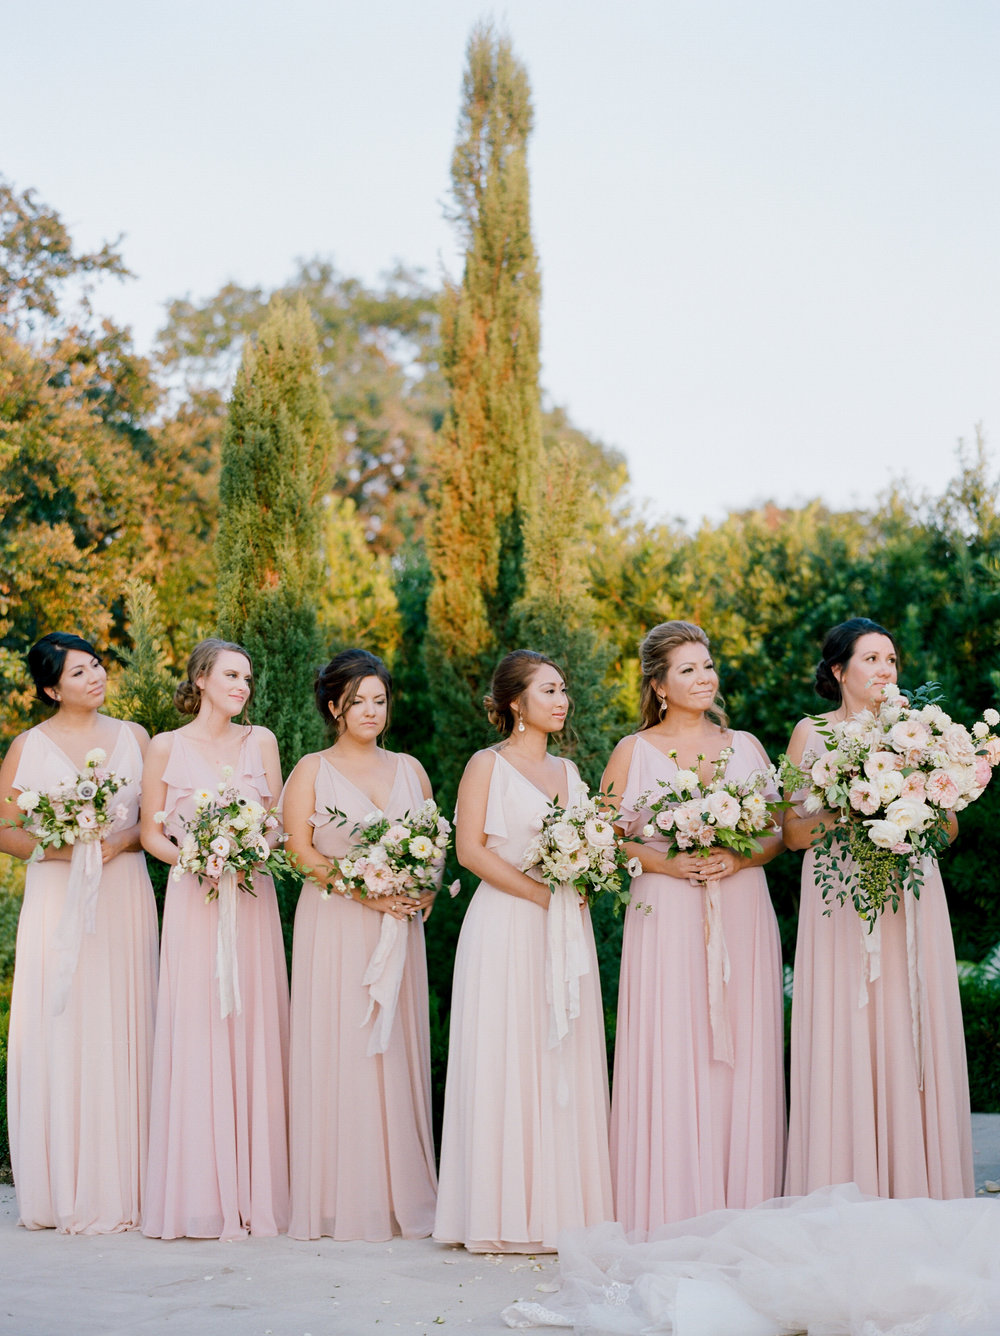 Martha-Stewart-Wedding-Dana-Fernandez-Photography-Josh-Texas-Film-Houston-Wedding-Fine-Art-Photographer-McGovern-Centennial-Gardens-Top-Best-33.jpg